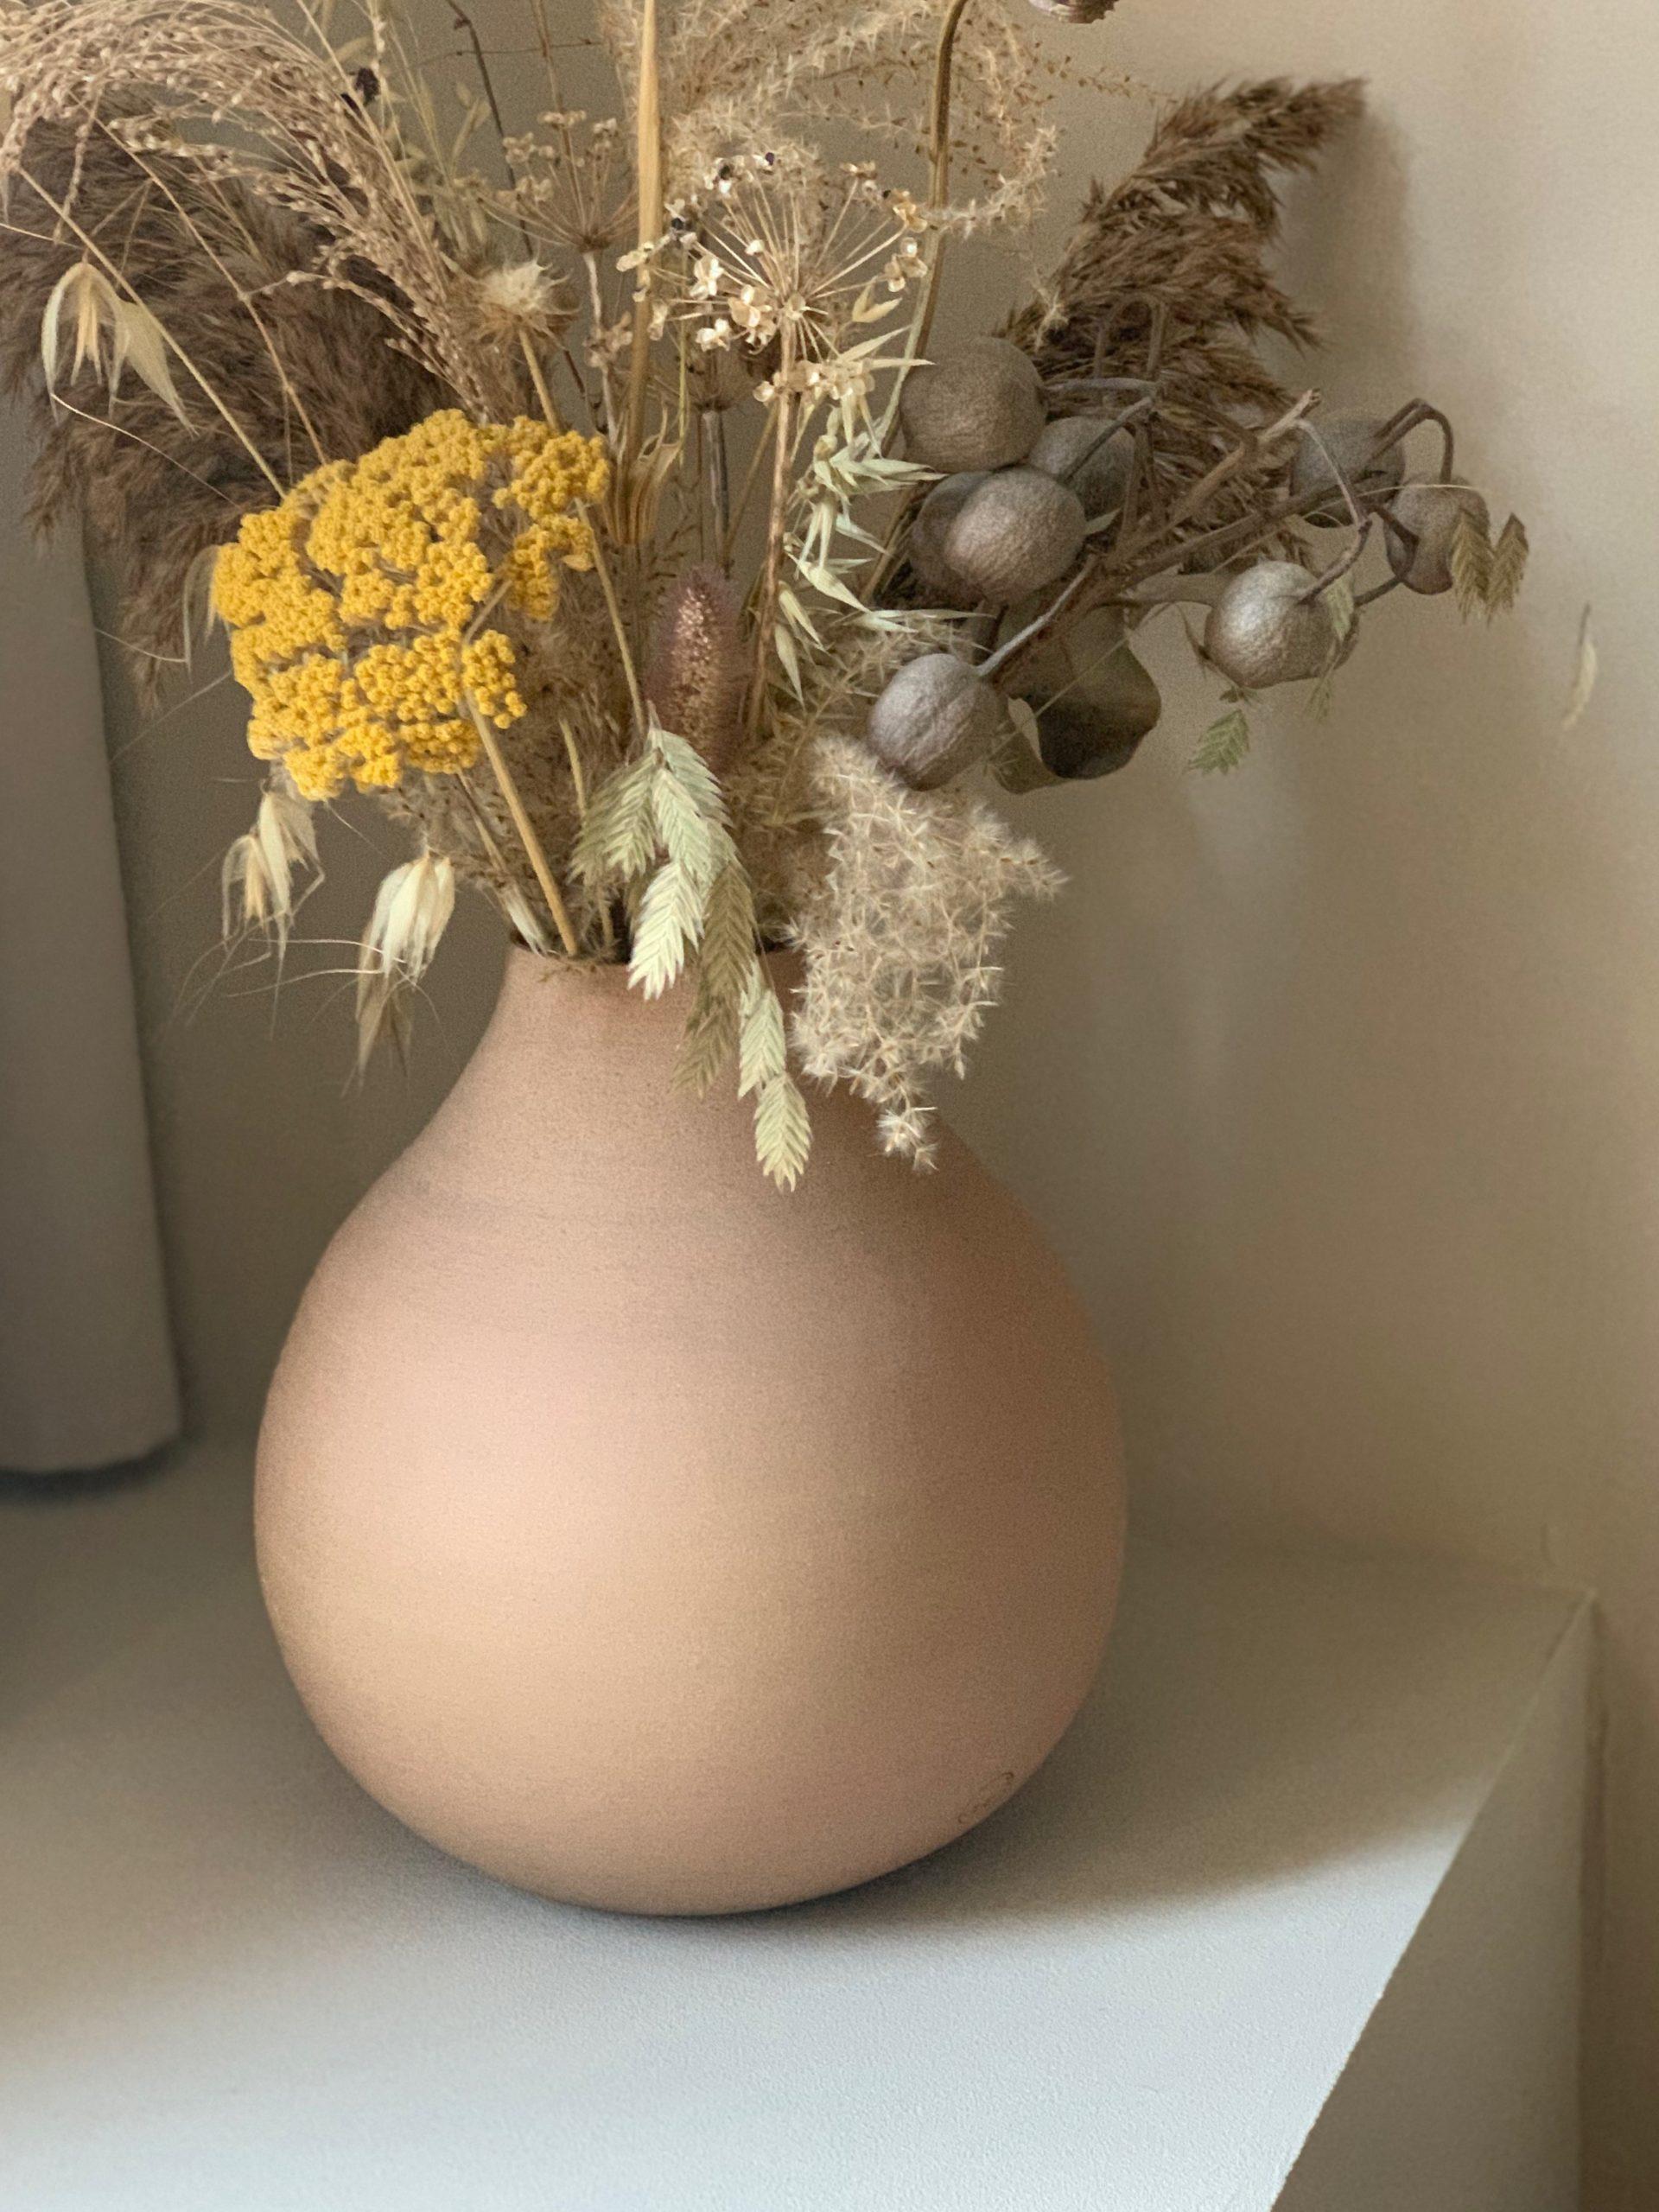 Autumnal bellied vase